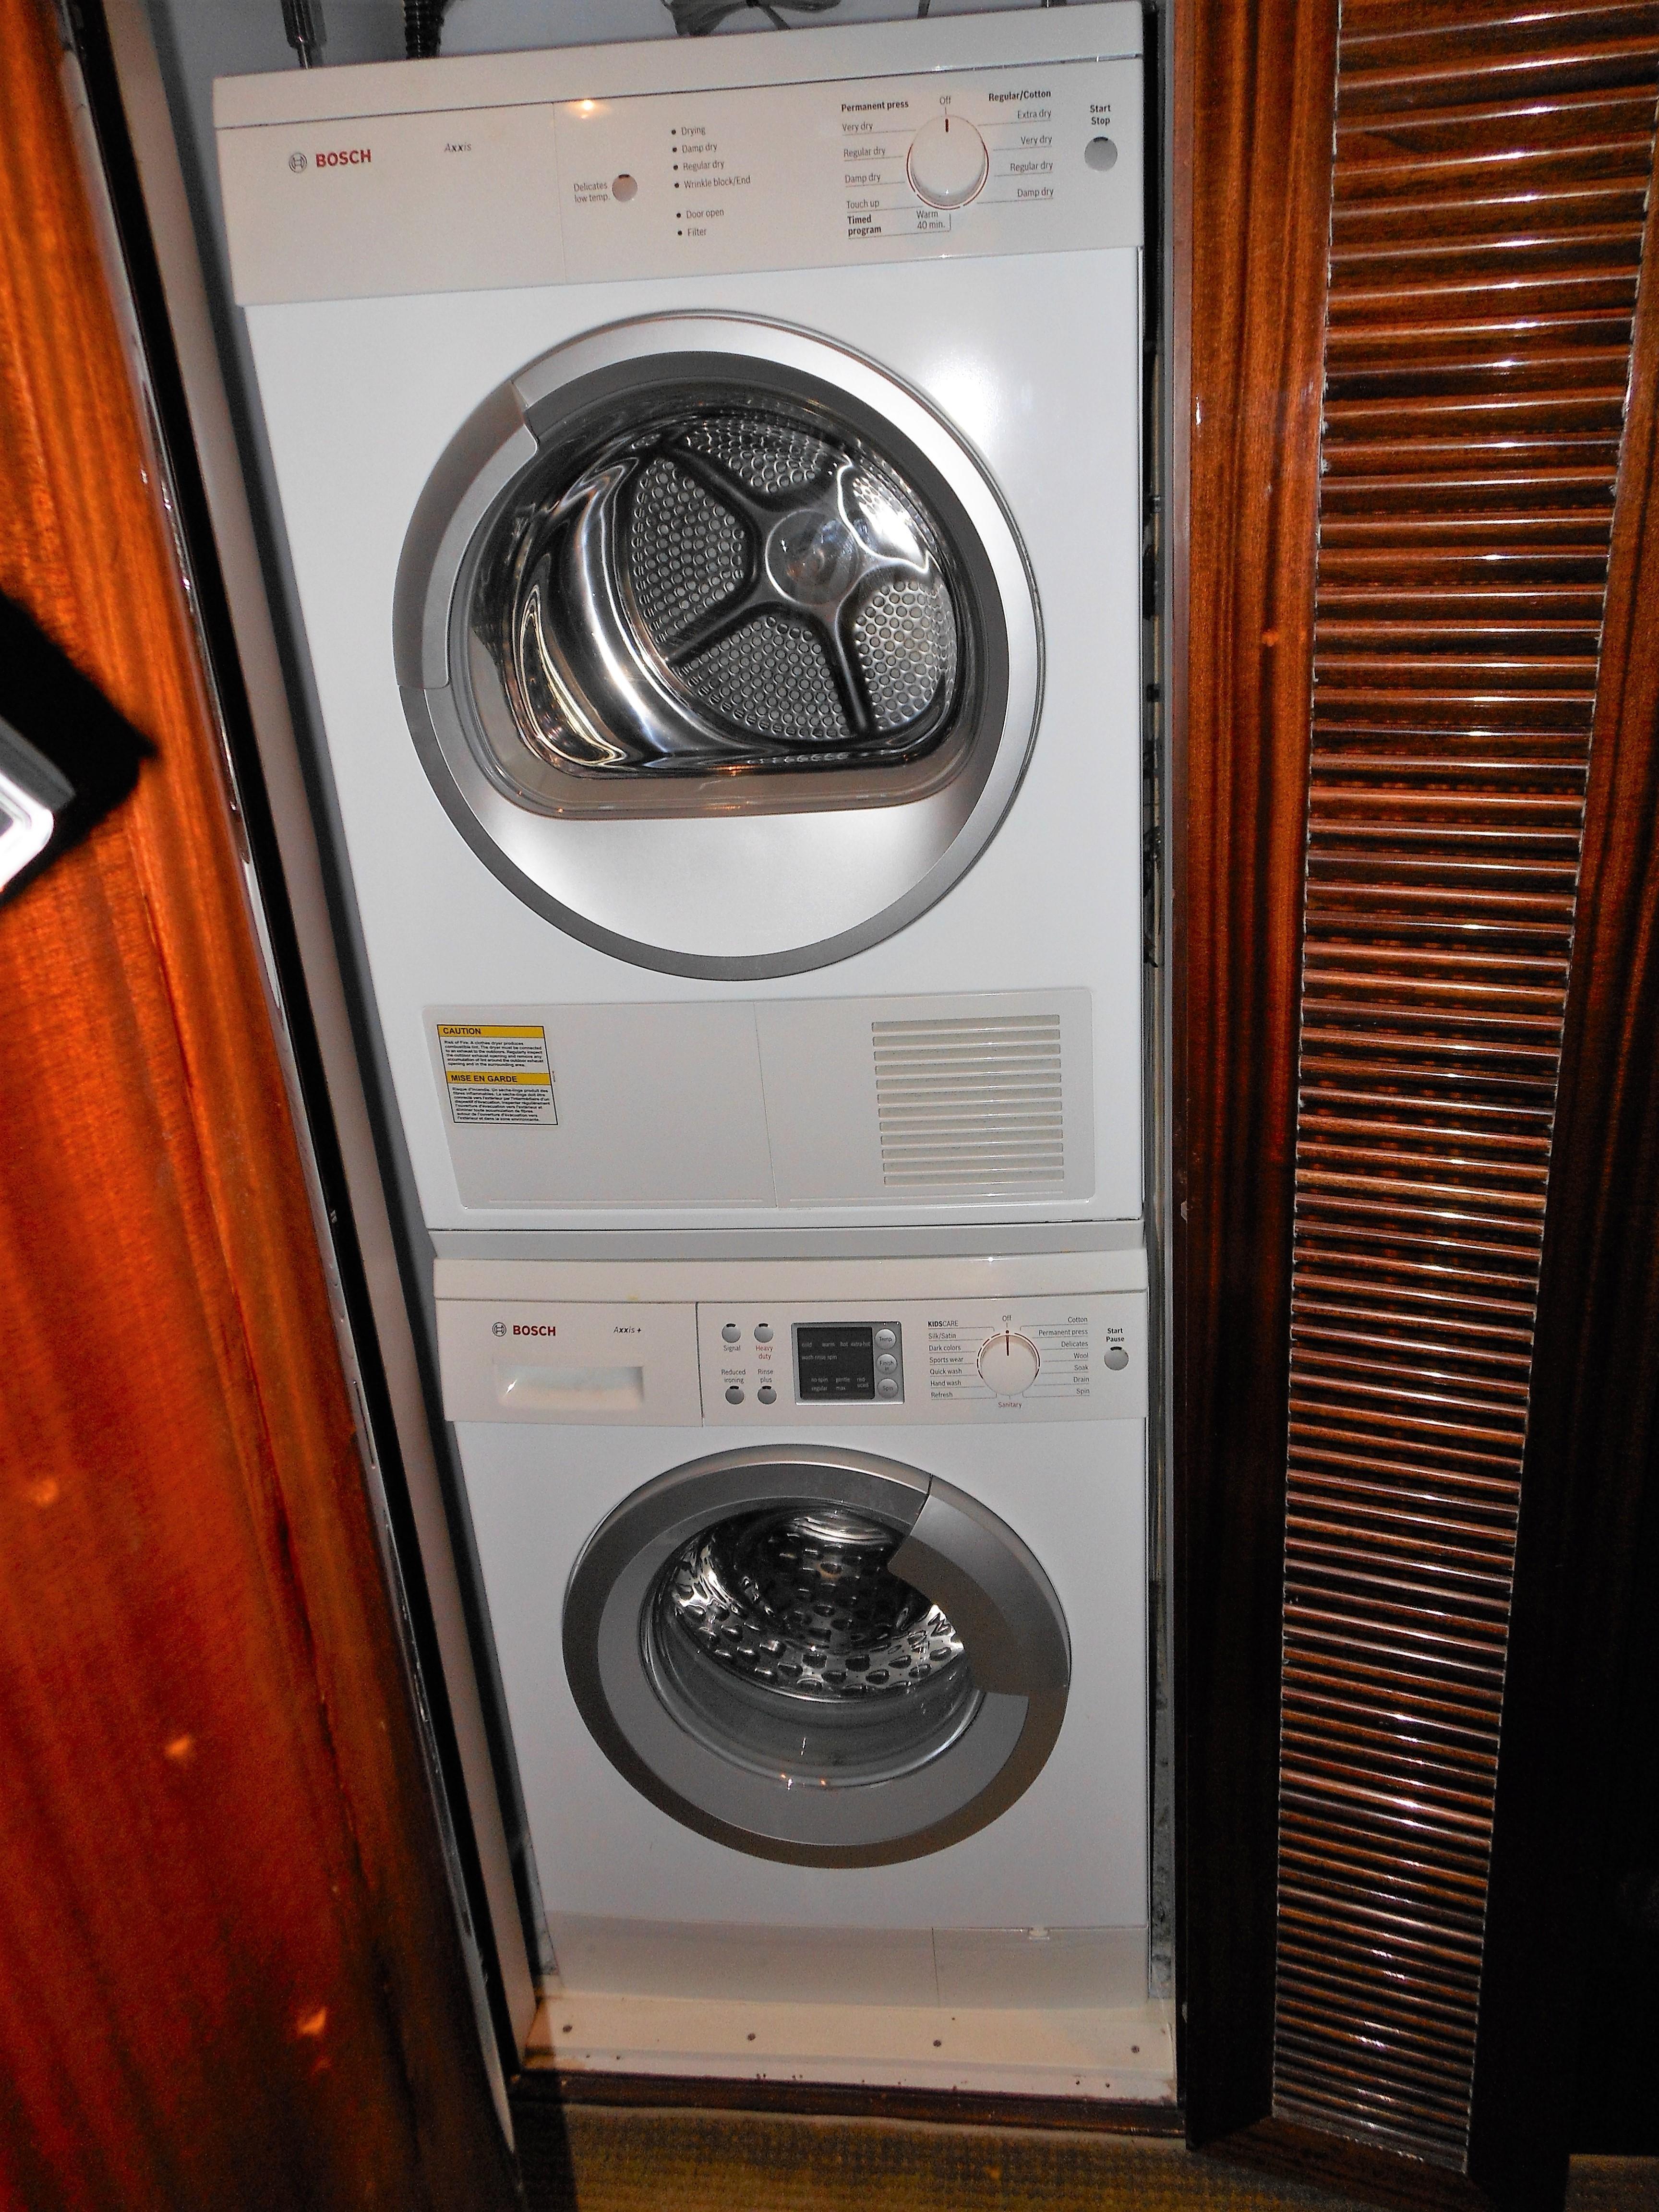 58 Symbol Bosch Washer Dryer - 2011